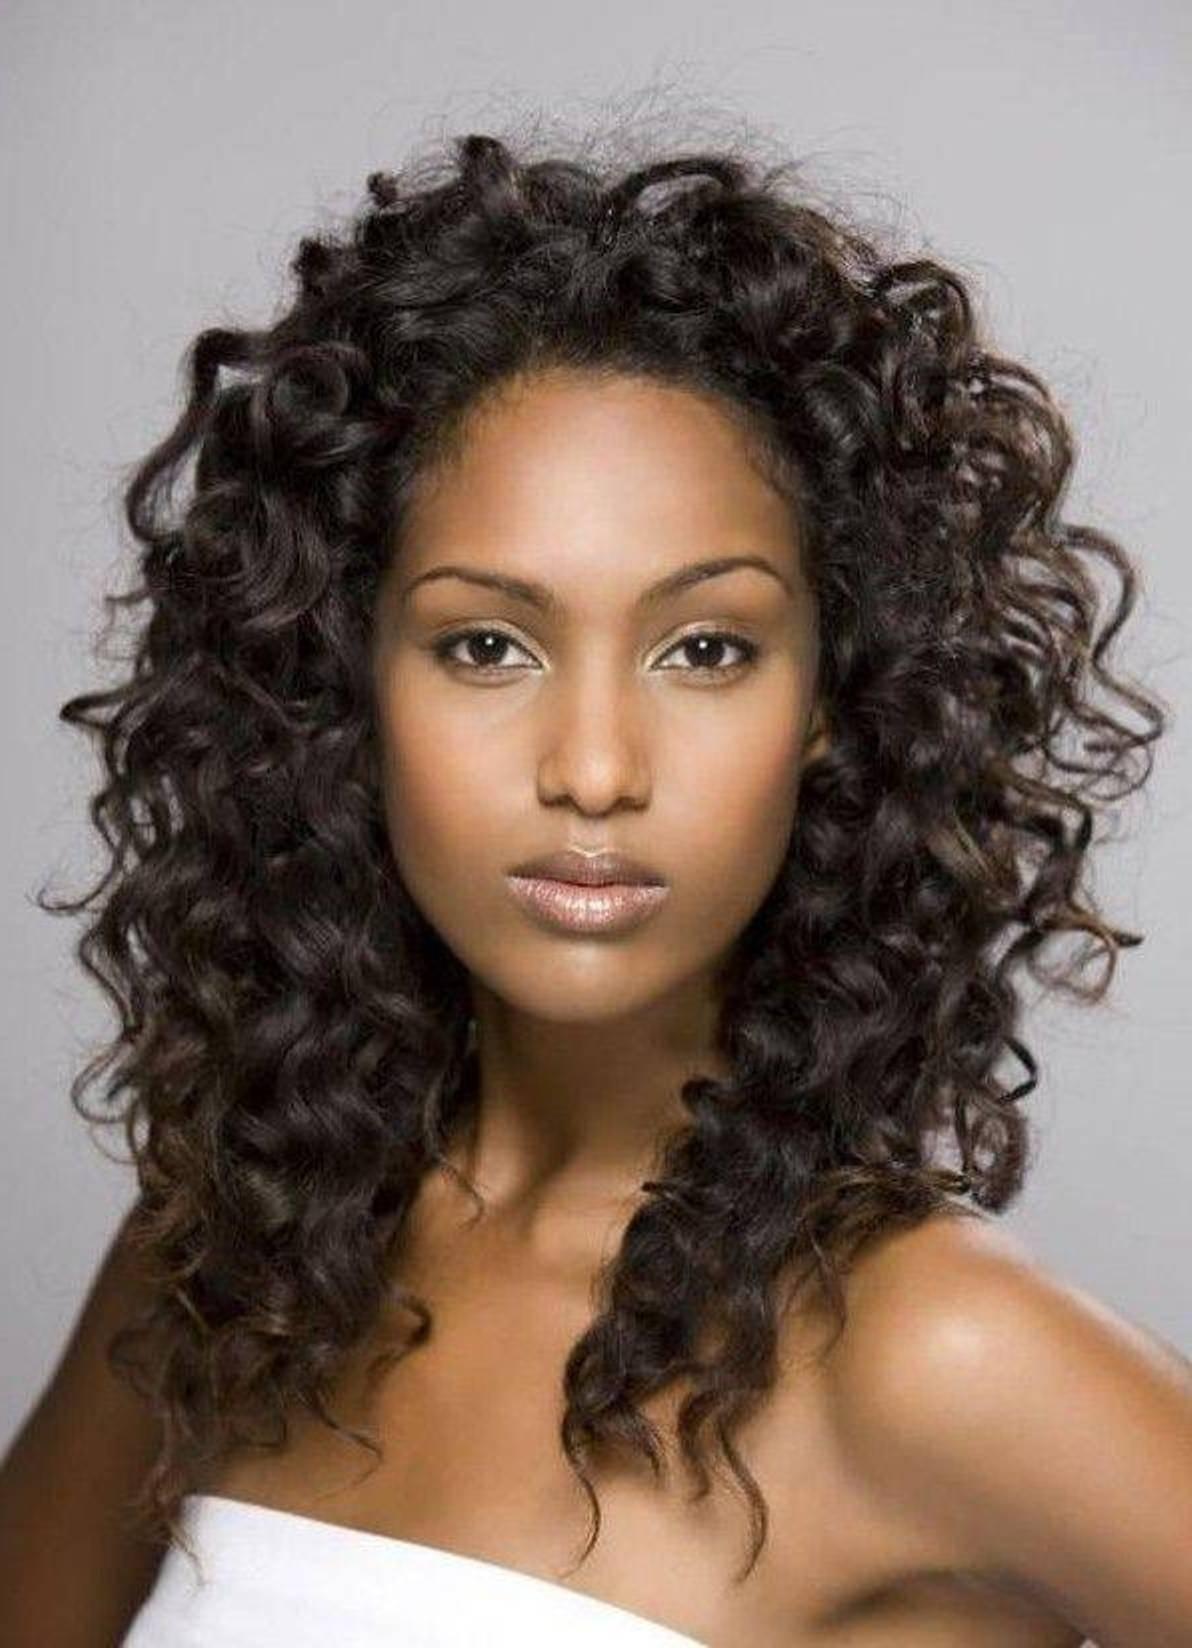 38+ African American Women Wallpaper on WallpaperSafari